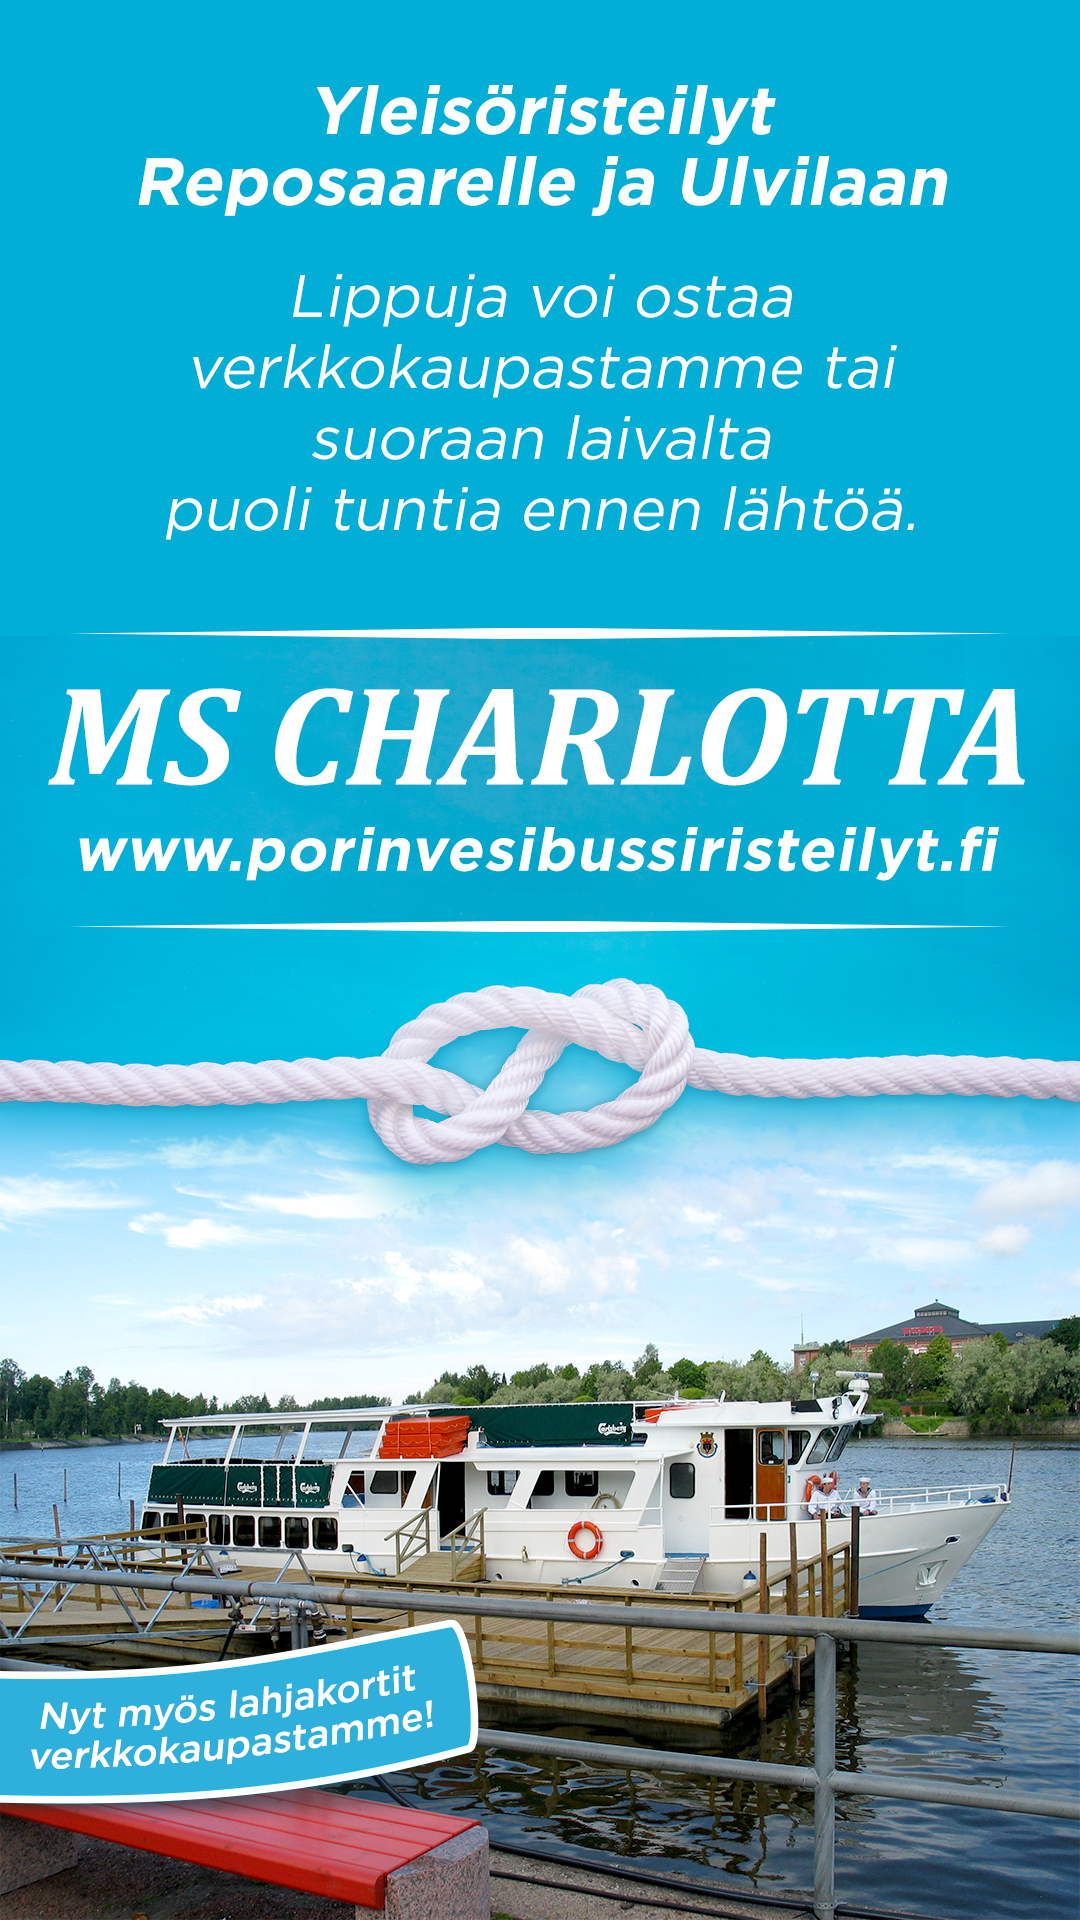 Yleisöristeily Porista Ulvilaan ke 5.8